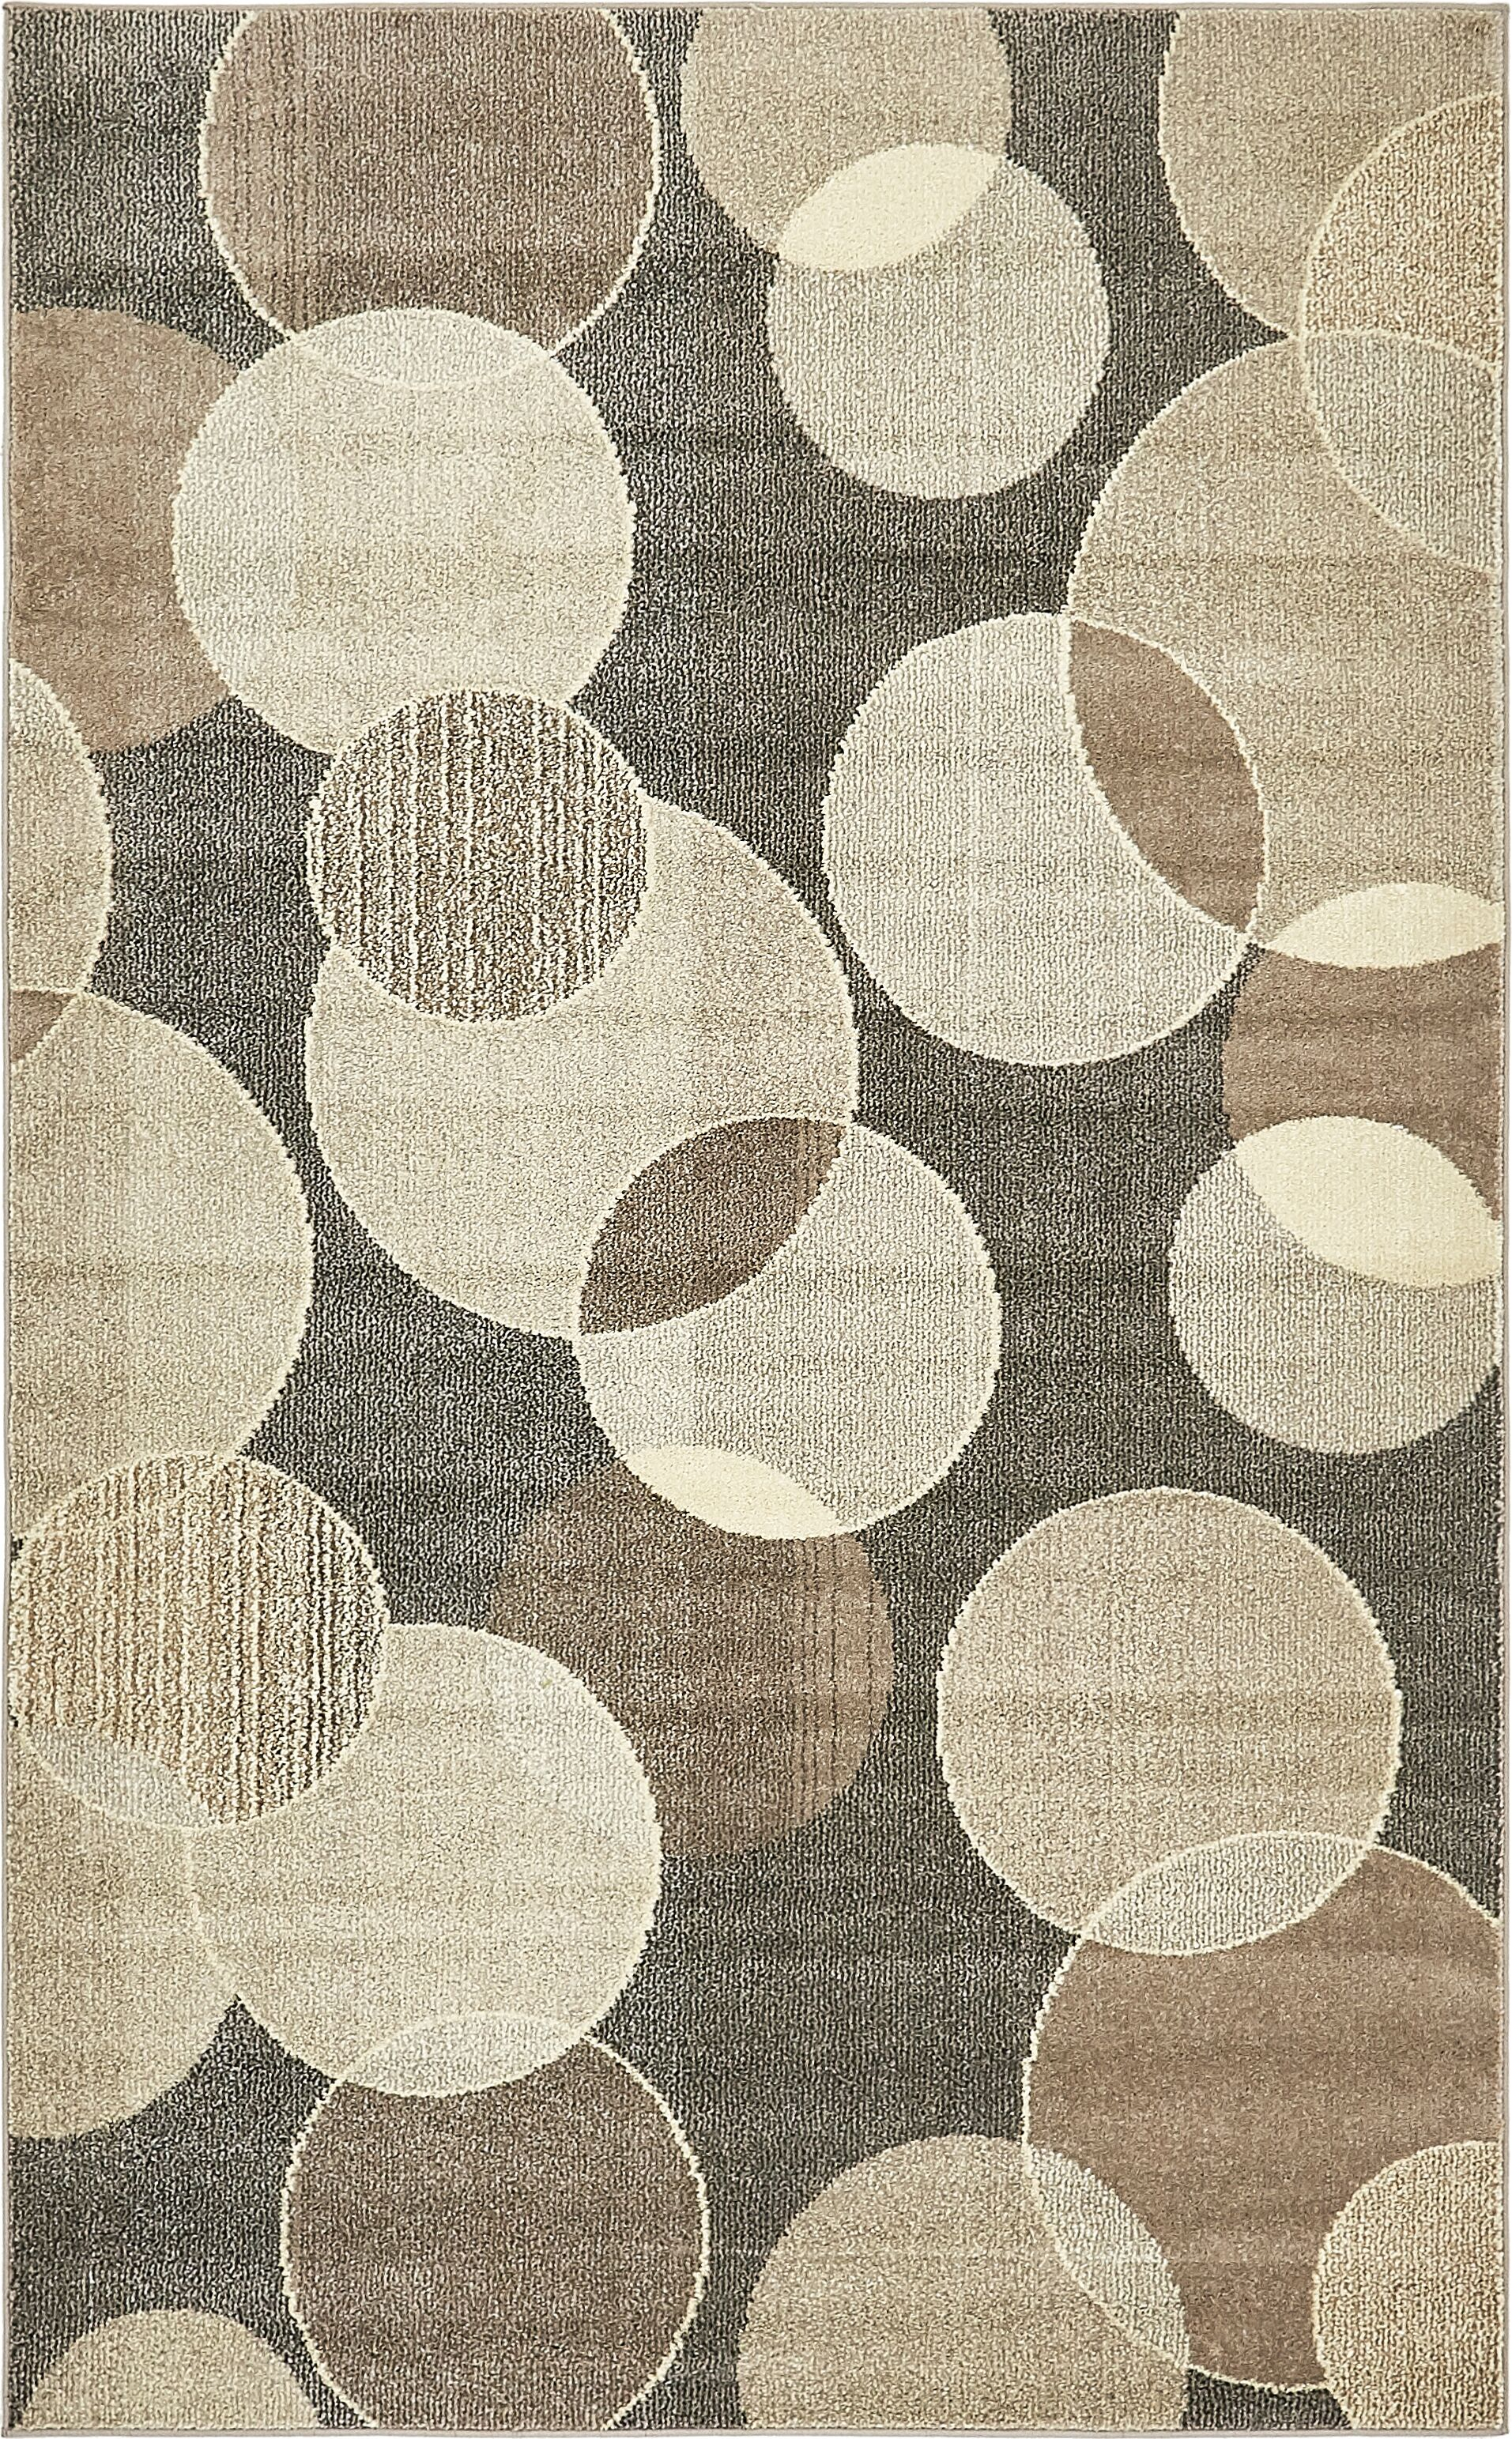 Chenango Rectangle Gray Area Rug Rug Size: Rectangle 5' x 8'